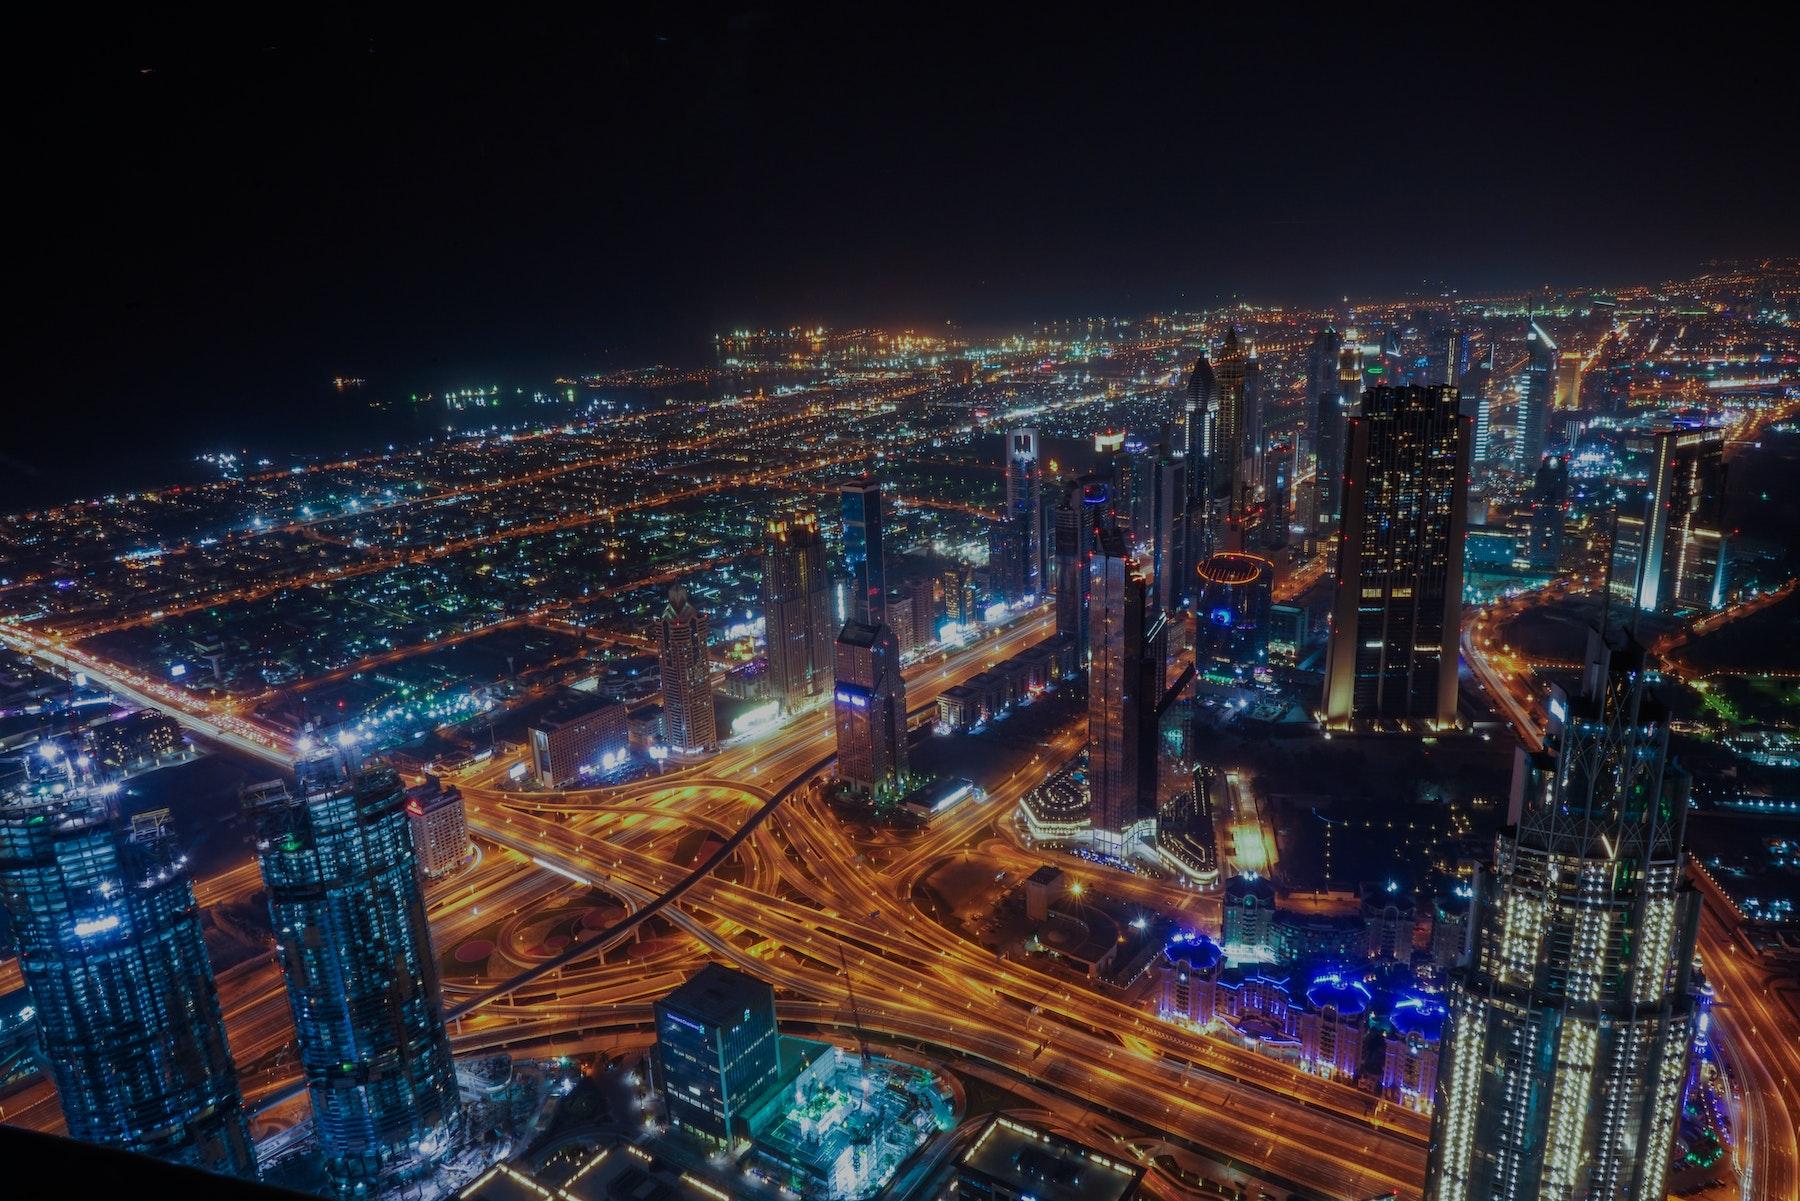 Skywalk Dubai